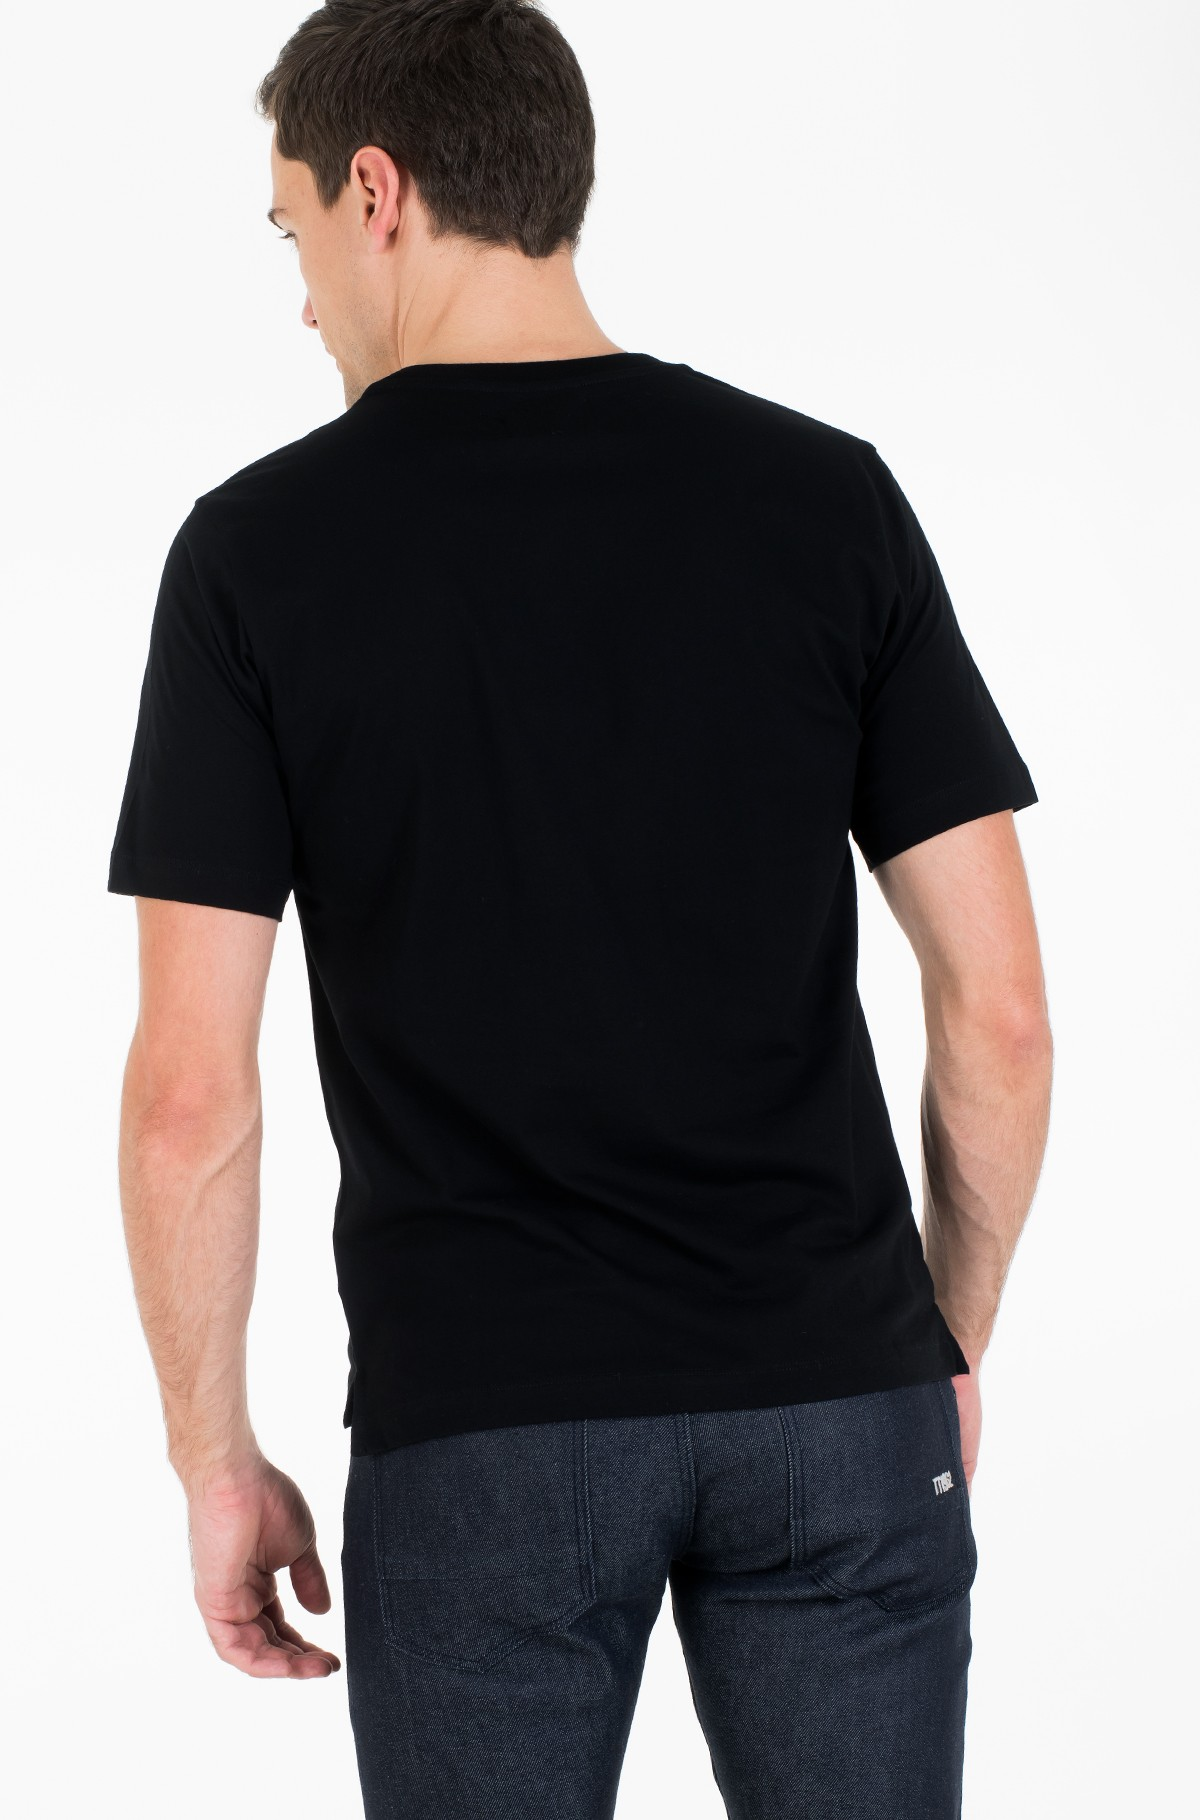 T-shirt MONOCHROME MONOGR AM BOX REG S/S-full-2